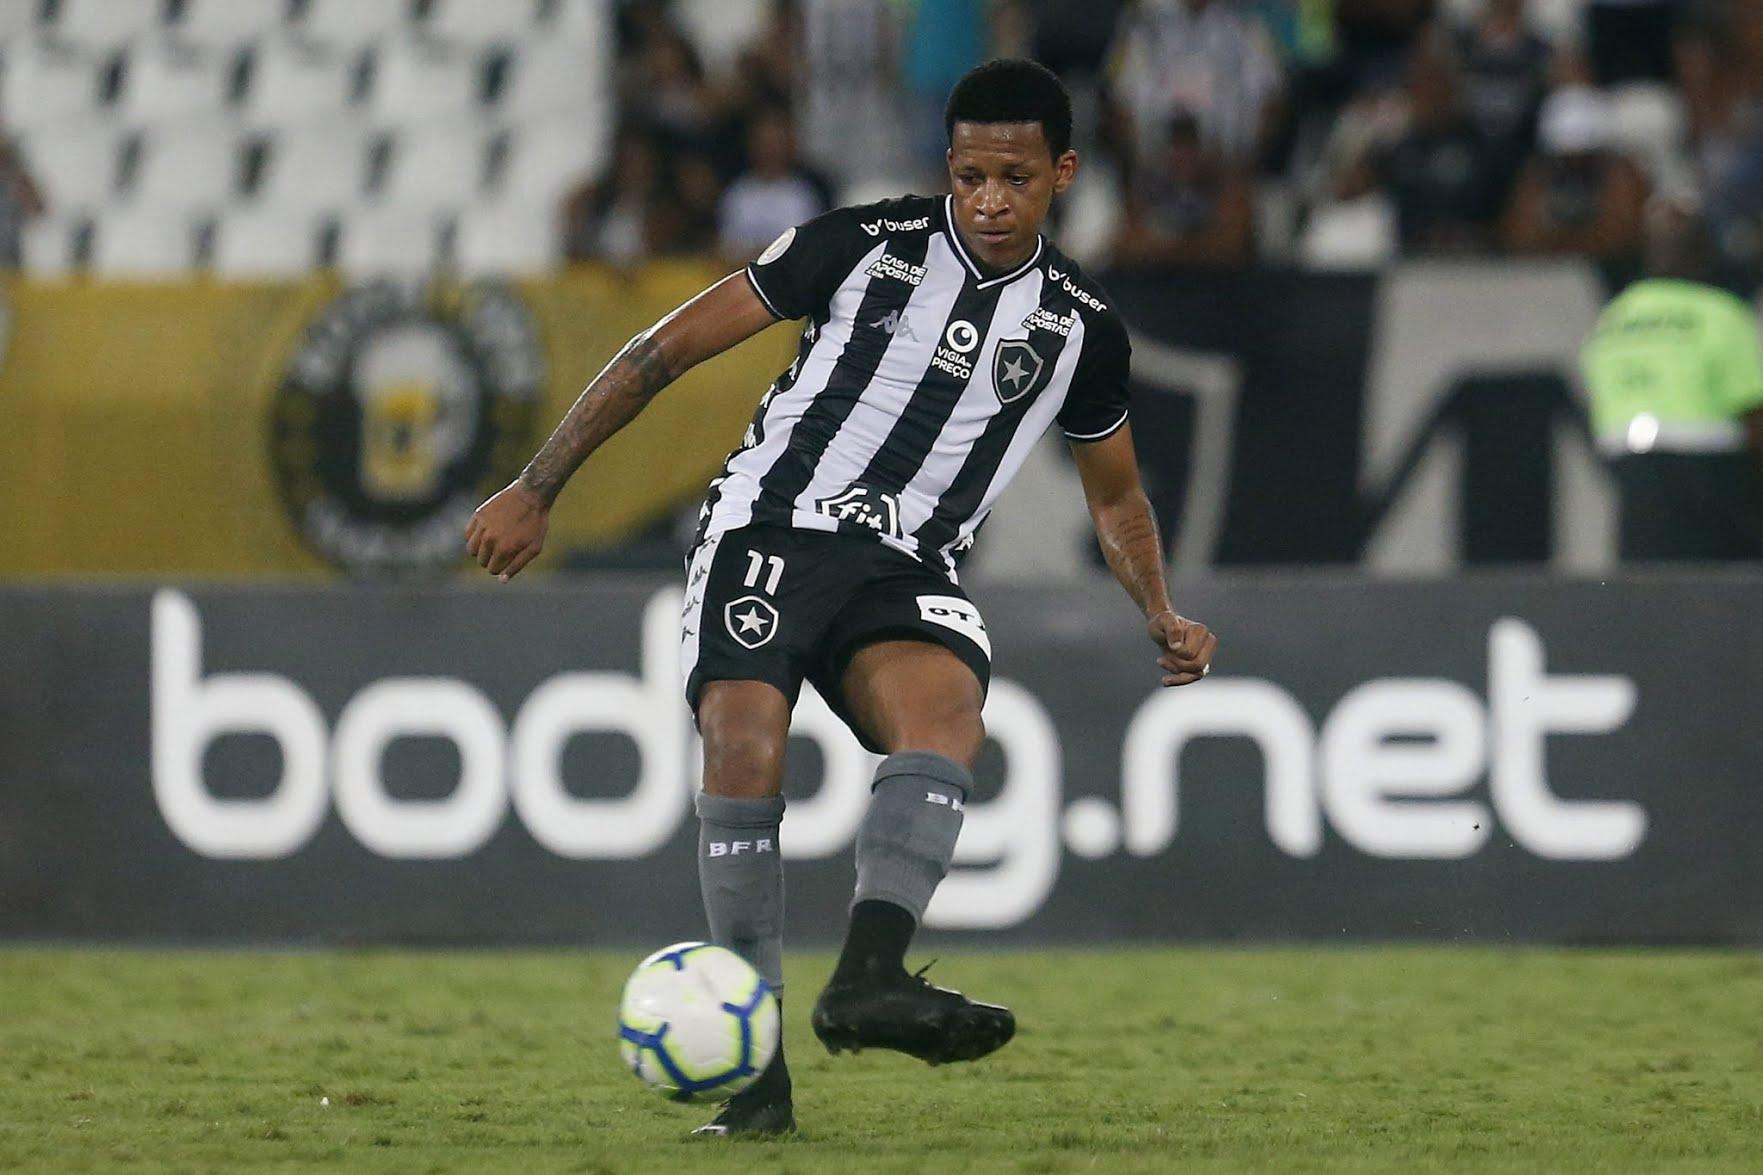 Gustavo Bochecha, do Botafogo, volta a ser elogiado por Eduardo Barroca, técnico do Coritiba